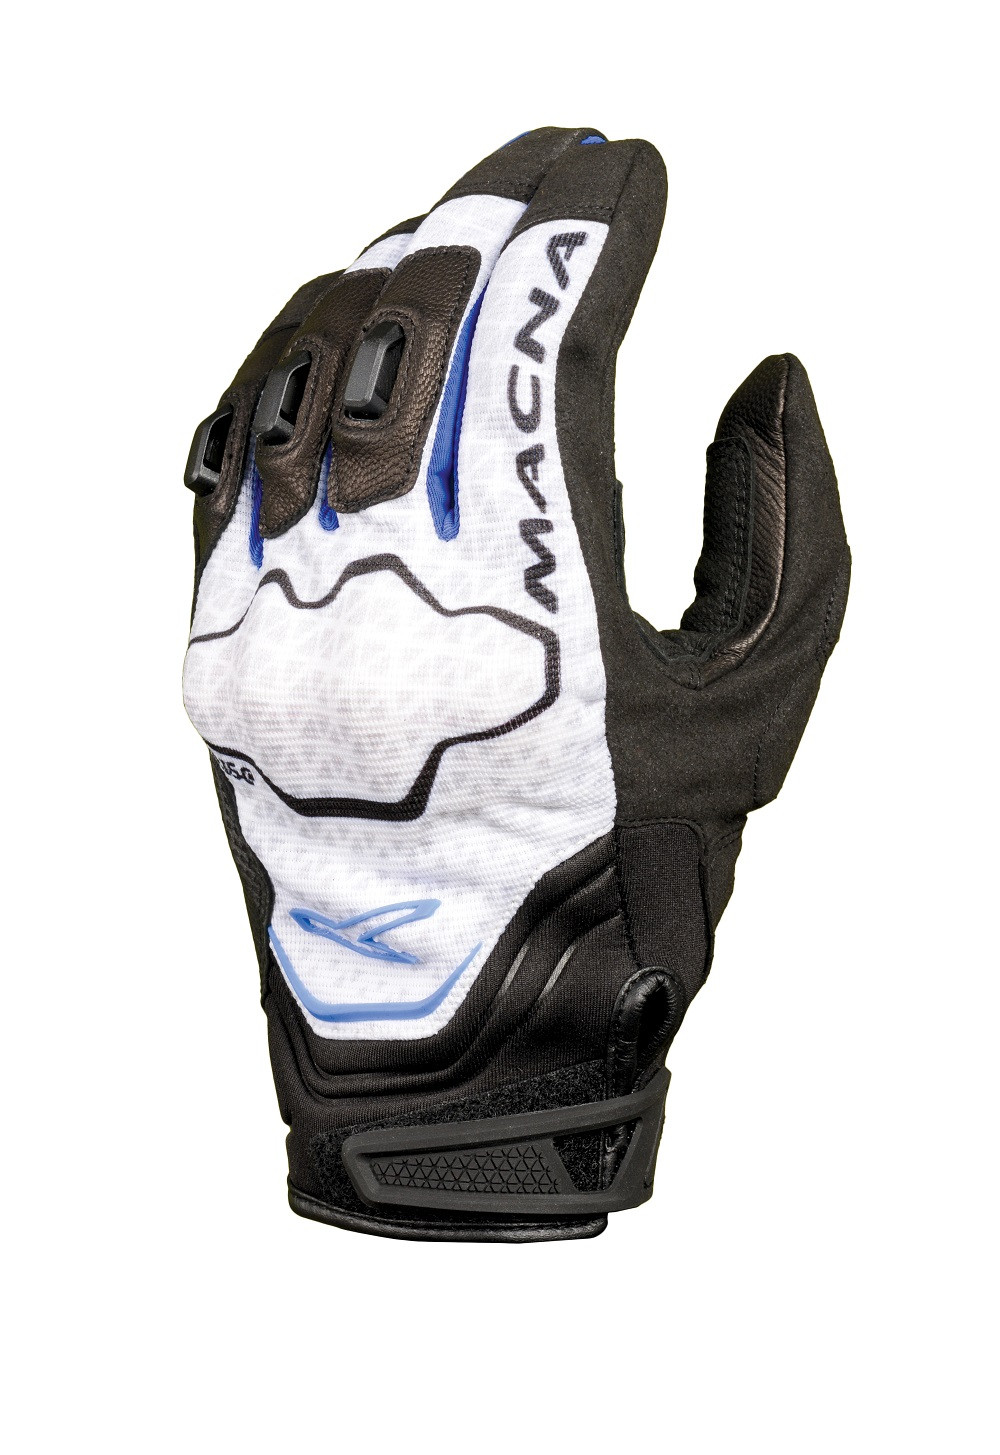 Macna leather summer gloves Assault black blue